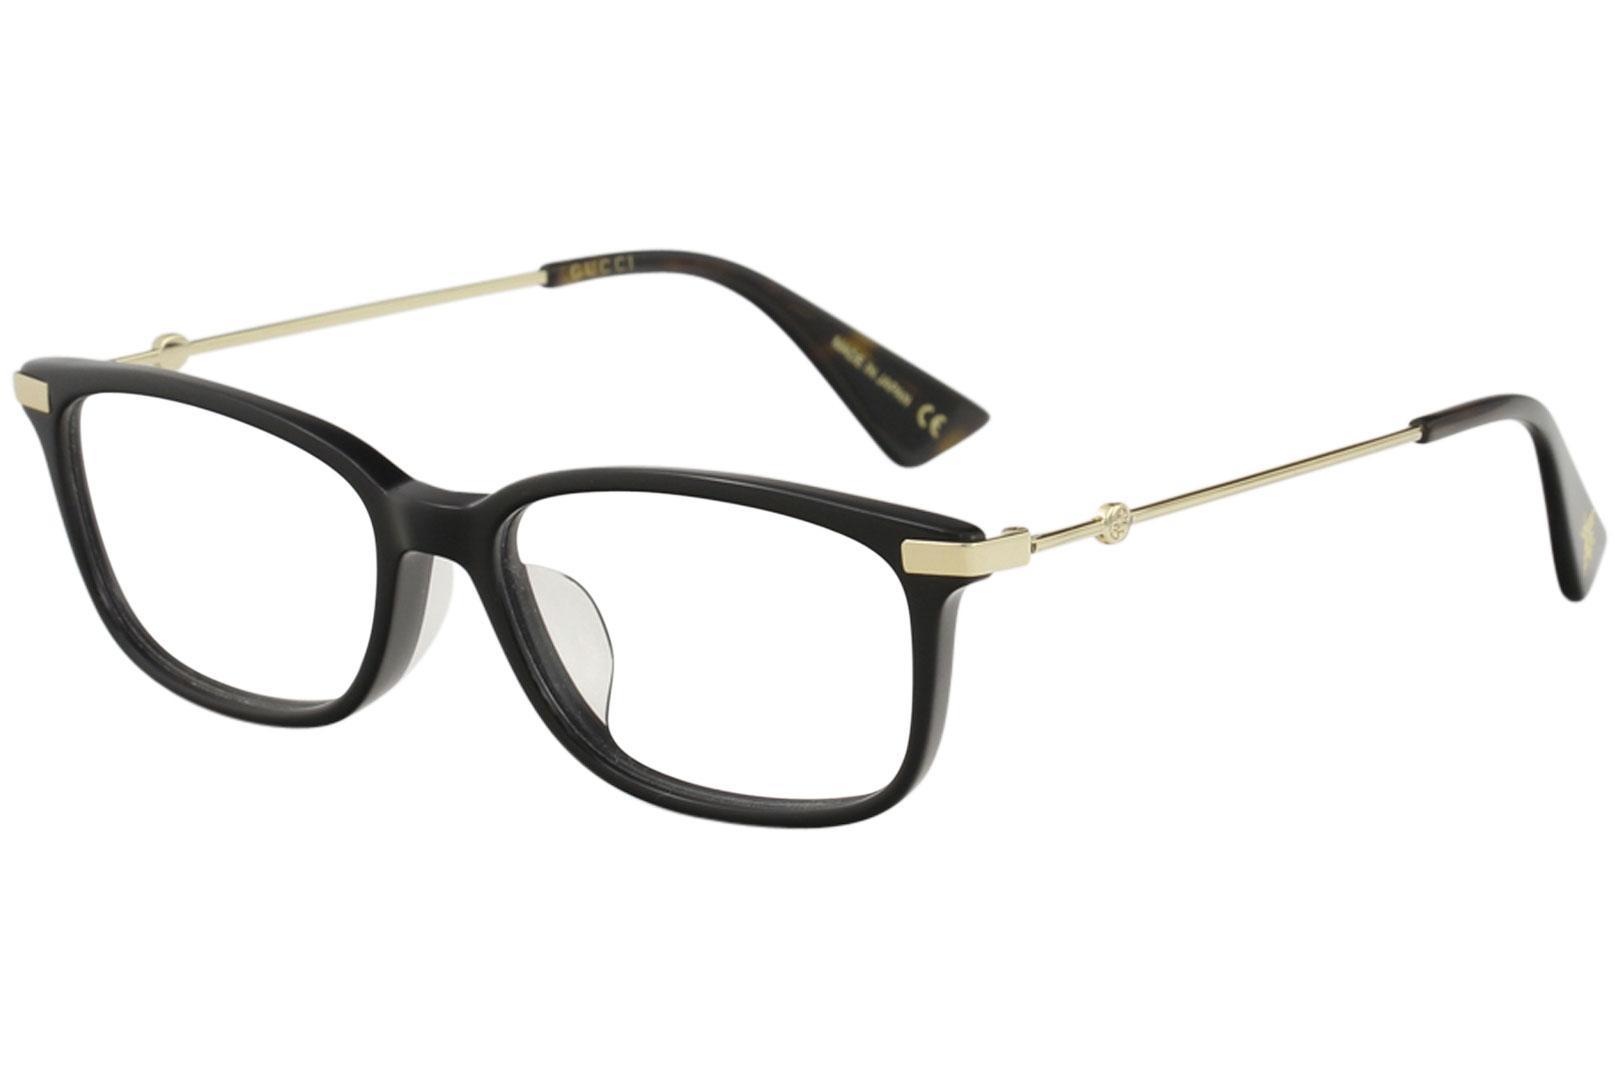 1b36a2c6acb Gucci Women's Eyeglasses GG0112OA GG/0112/OA Urban Full Rim Optical Frame